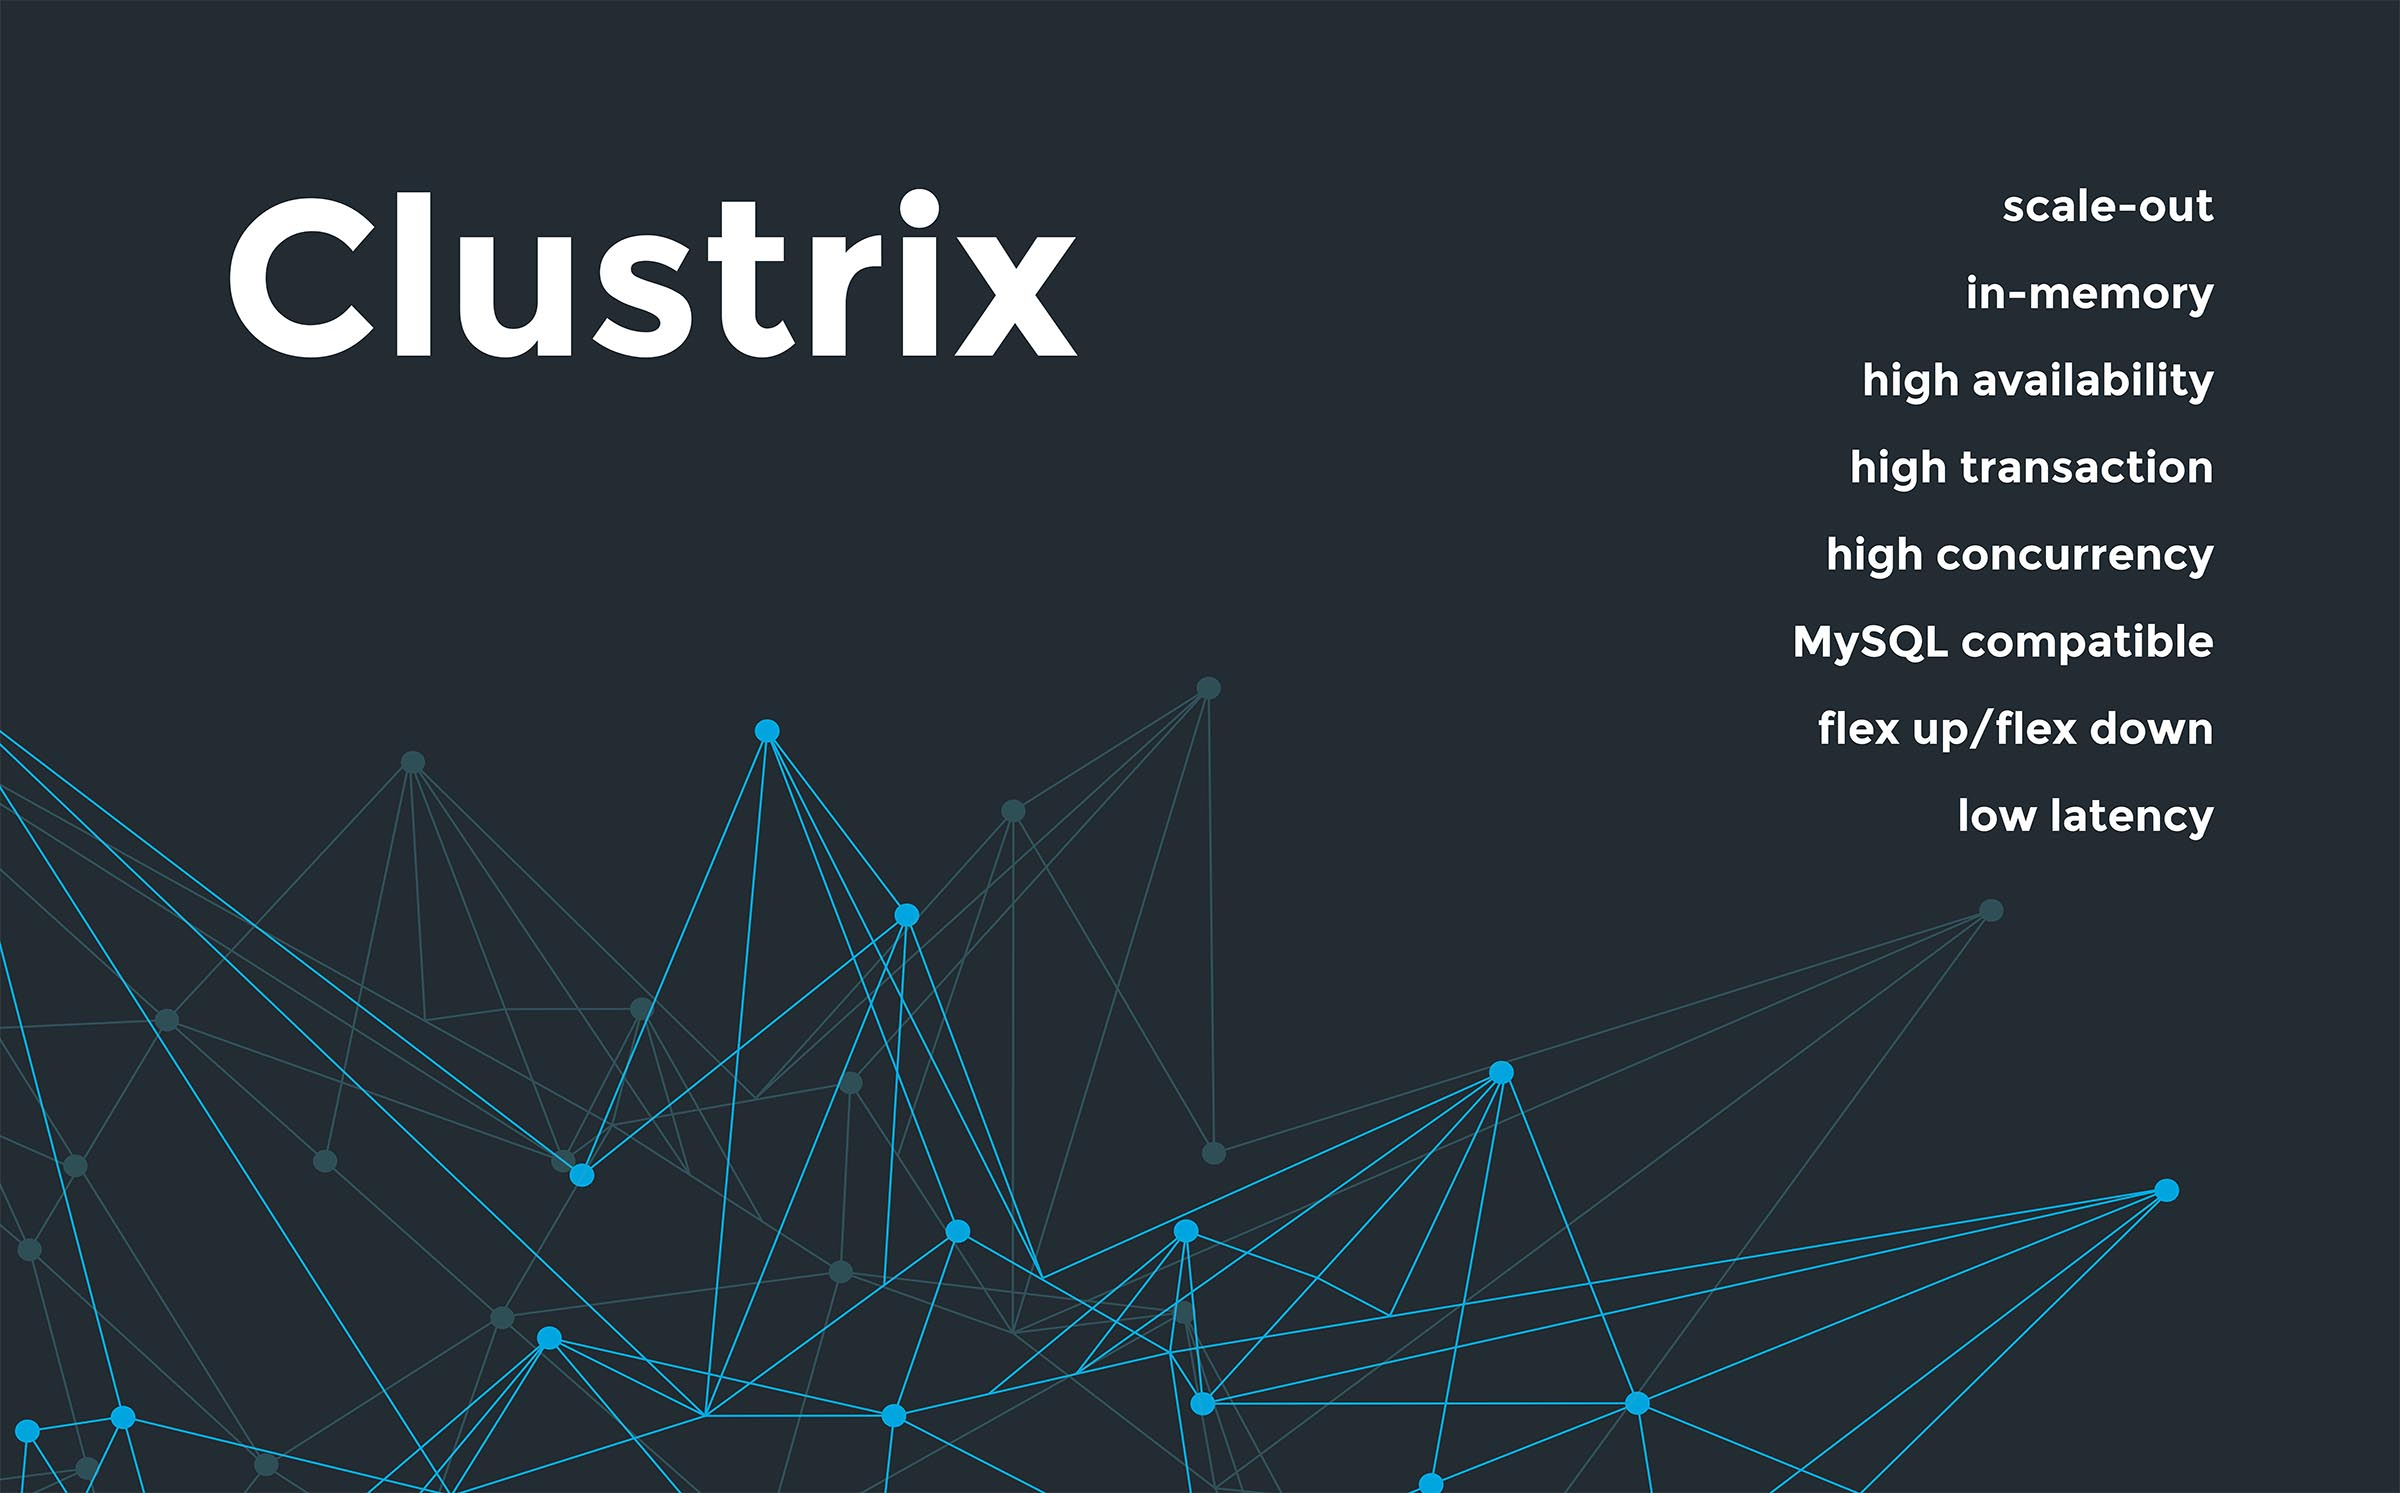 Clustrix_BoothSkin.jpg